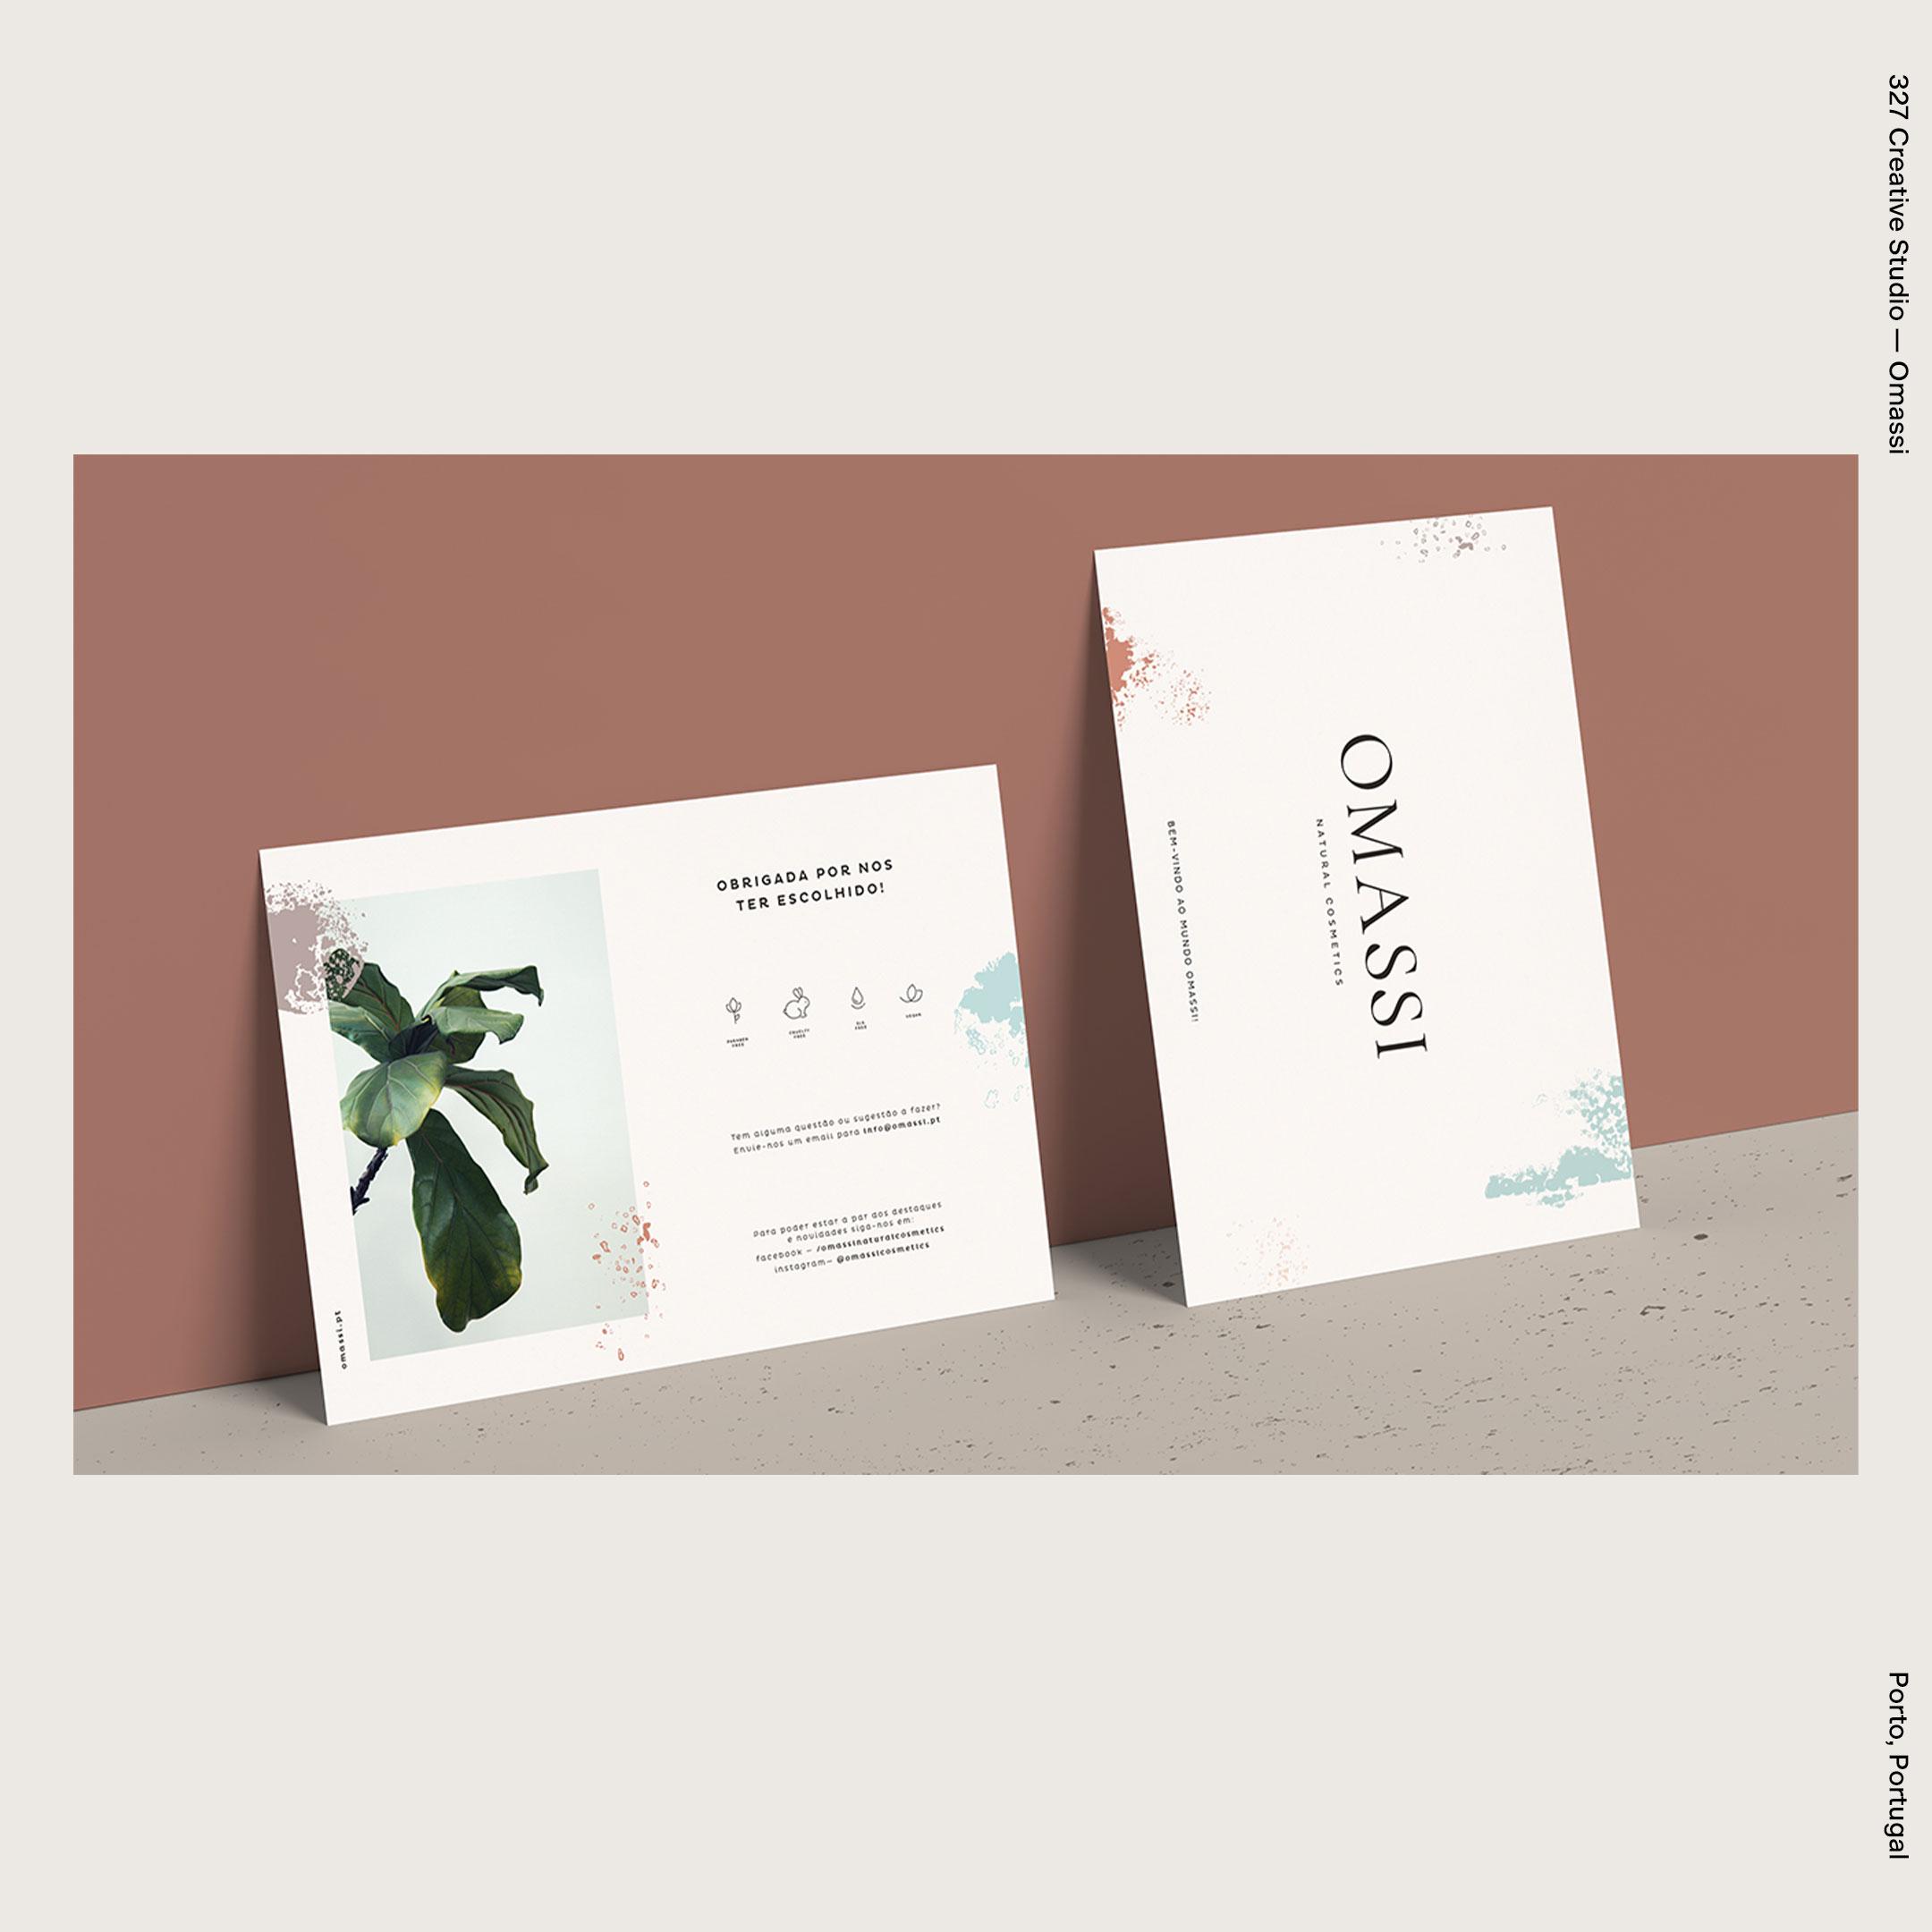 327 Creative Studio —Omassi